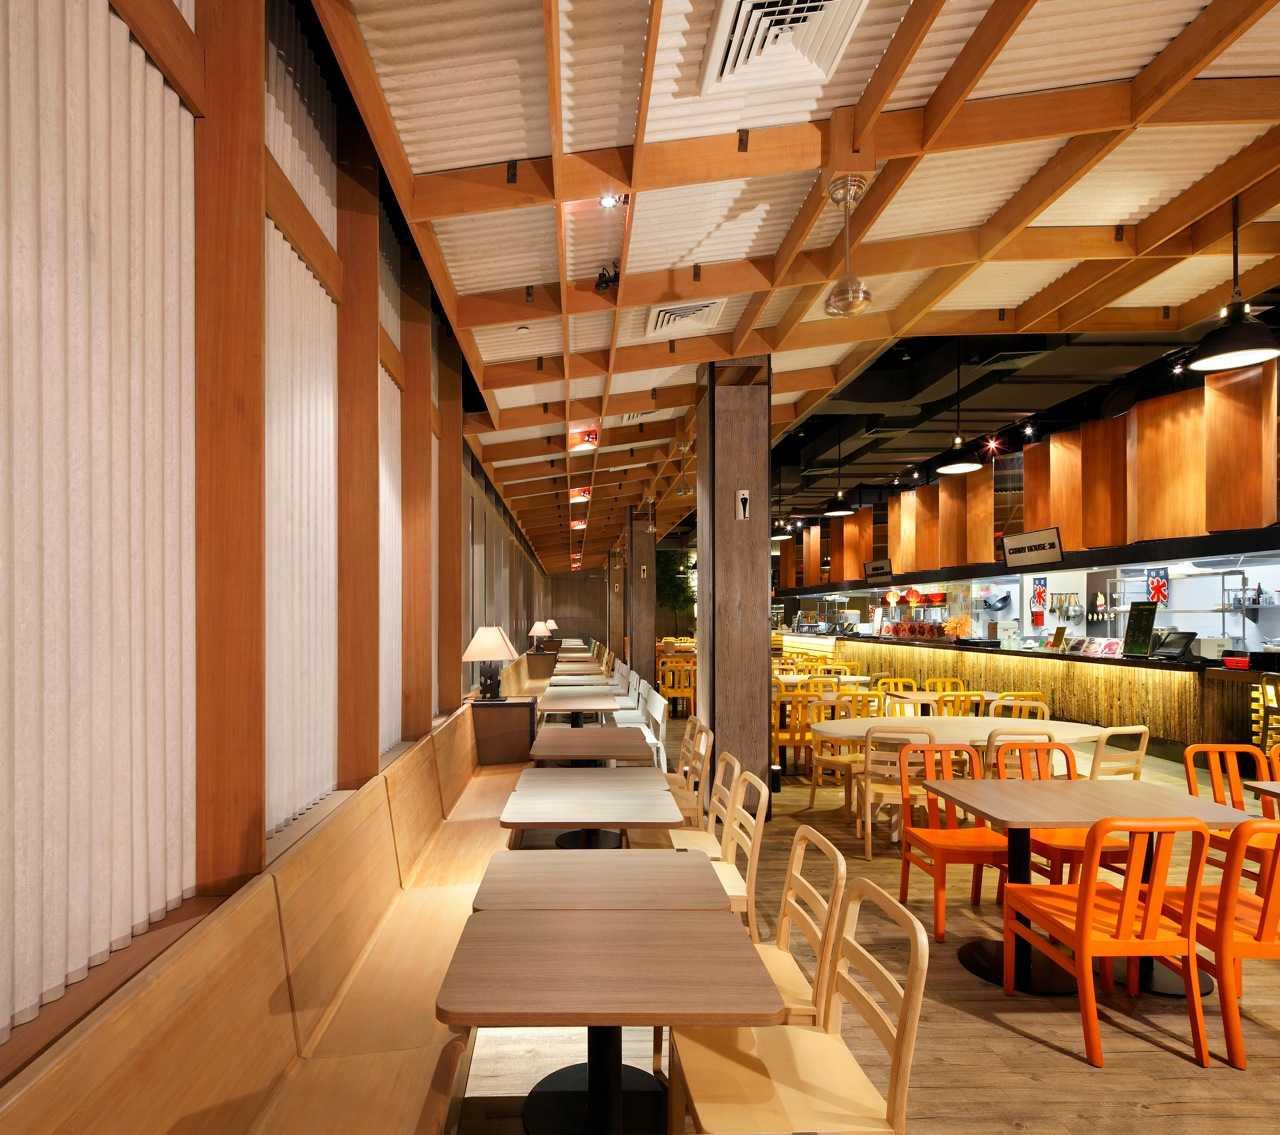 Ma-Ru Urban Kitchen  Plaza Indonesia Plaza Indonesia Seating Area Restaurant   15338